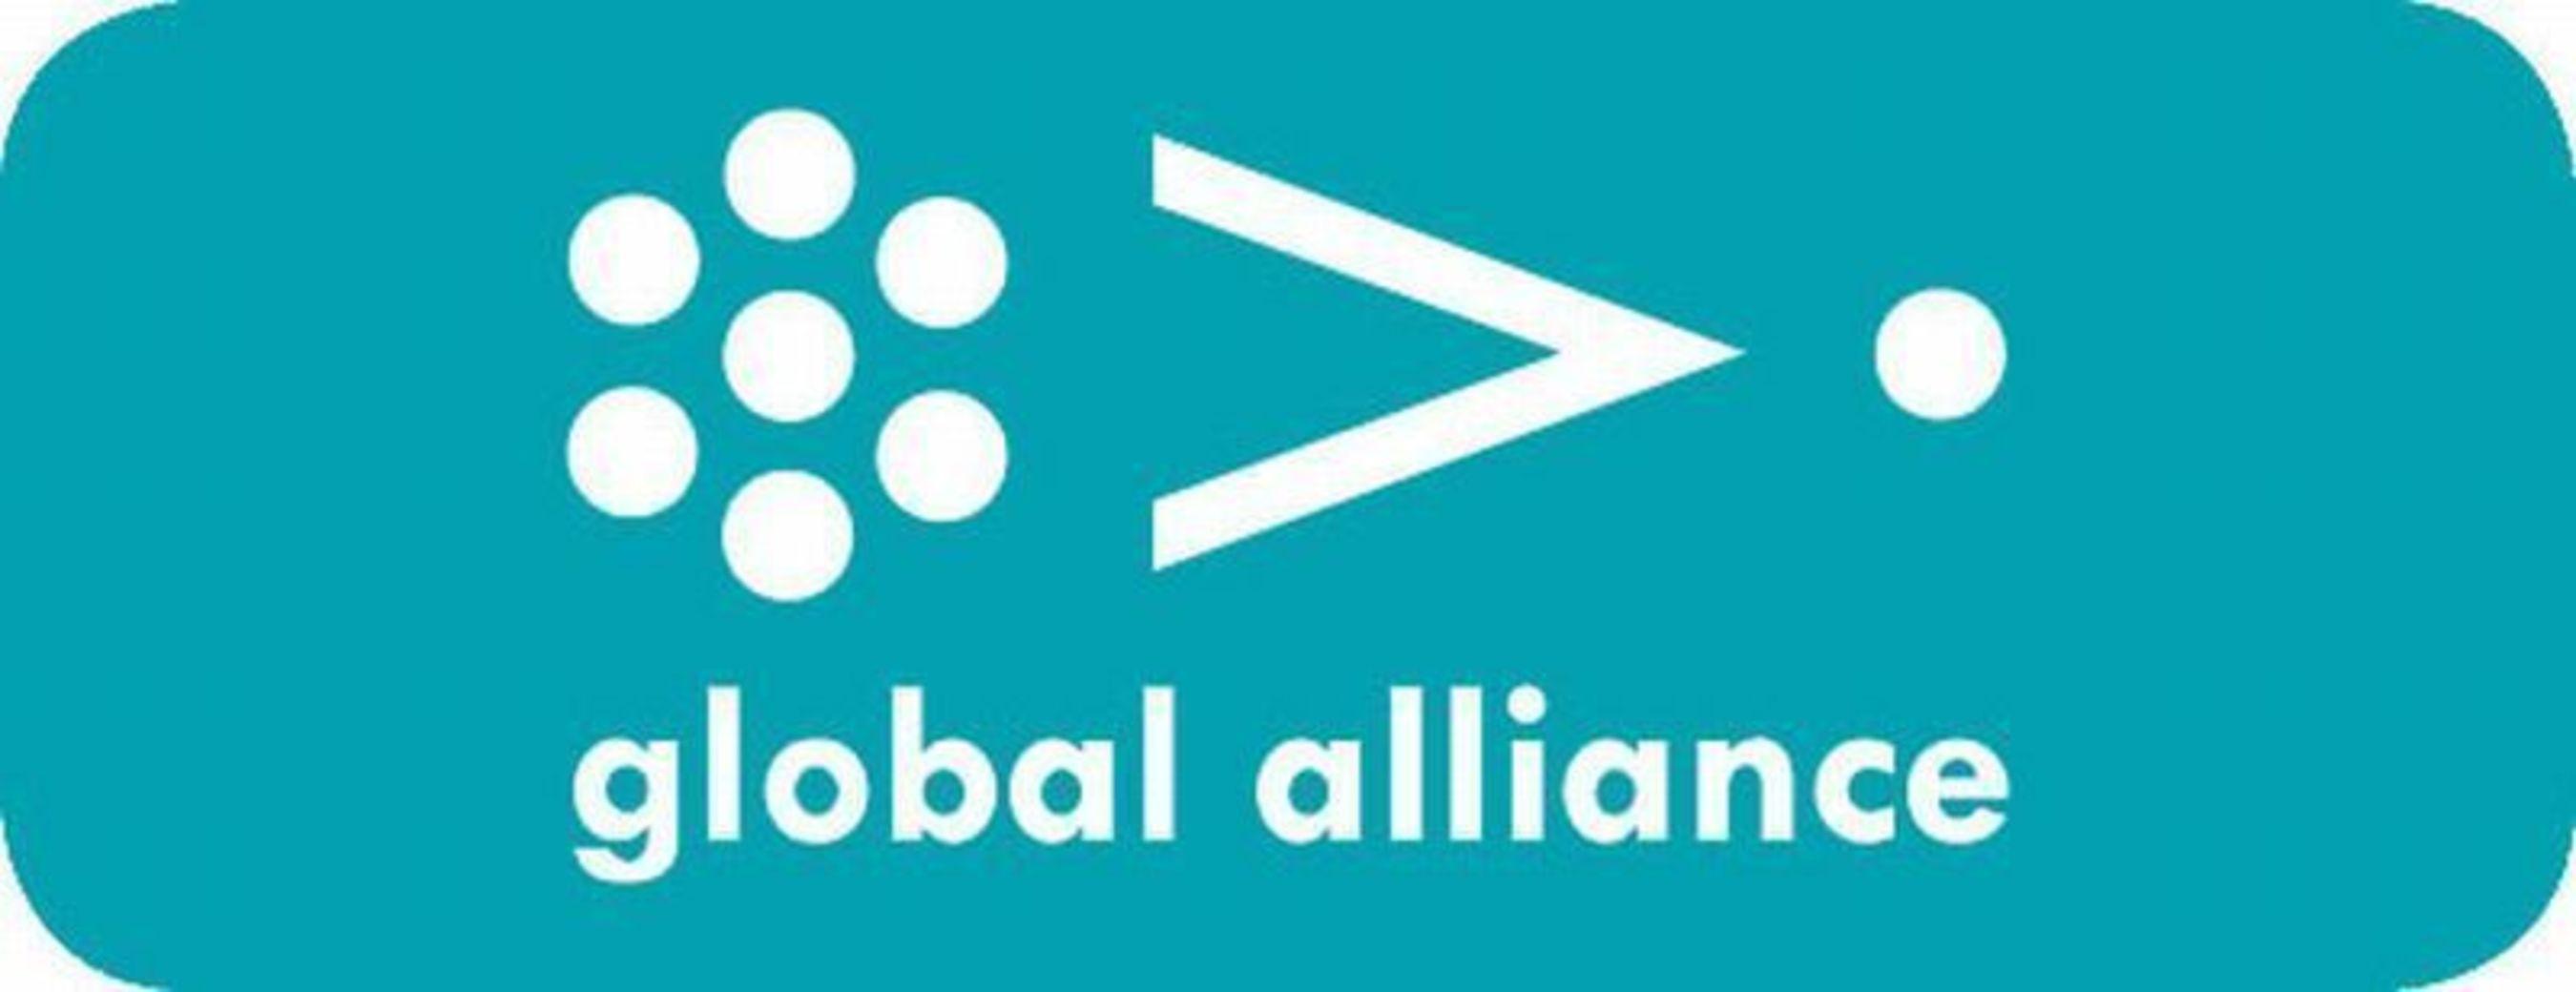 Global Alliance Logo (PRNewsFoto/Global Alliance)